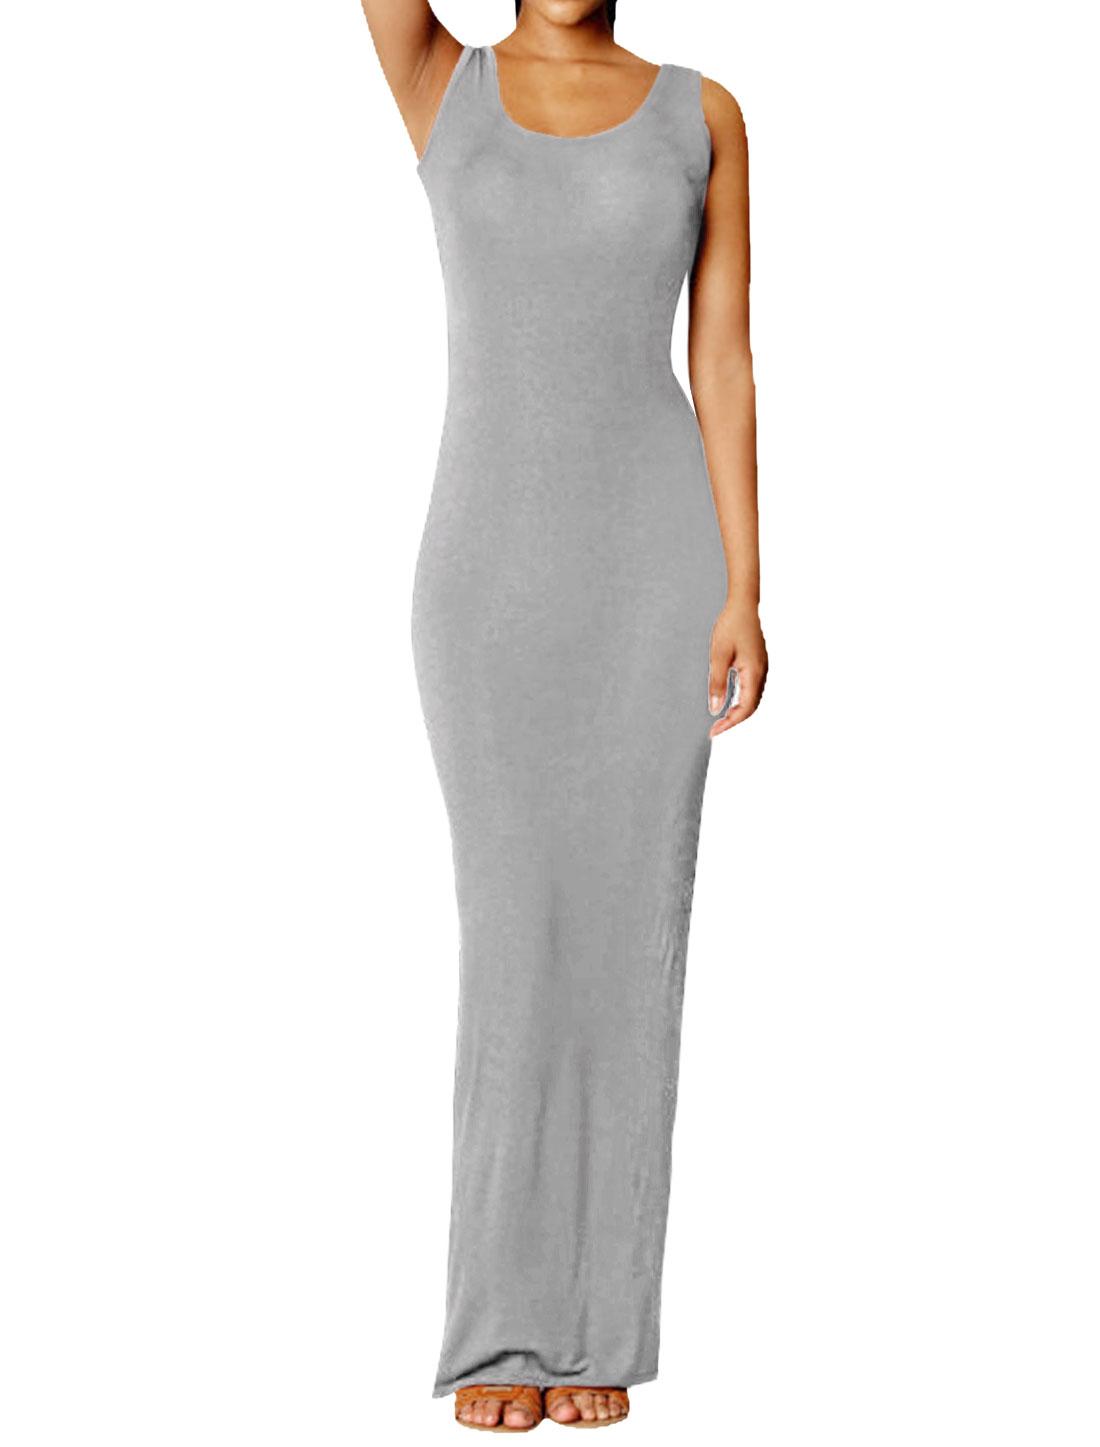 Ladies Slim Fit Scoop Neckline Casual Dress Light Gray S